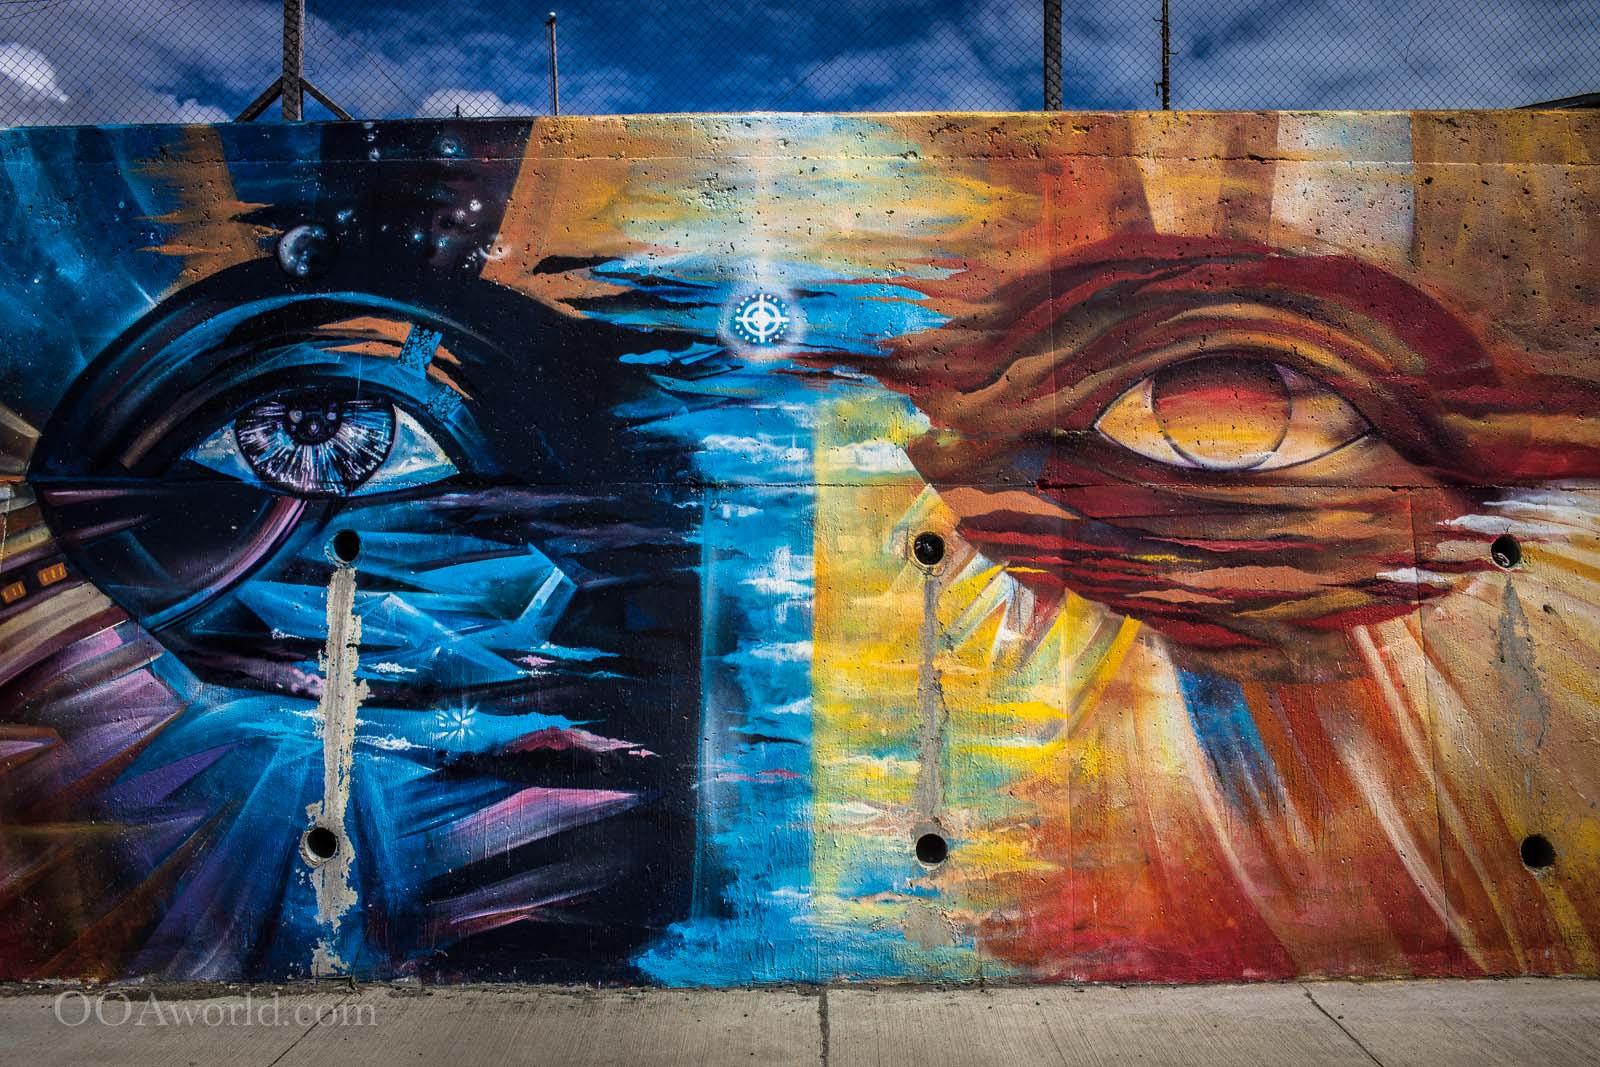 Tierra del Fuego Eyes of Fire Photo Ooaworld